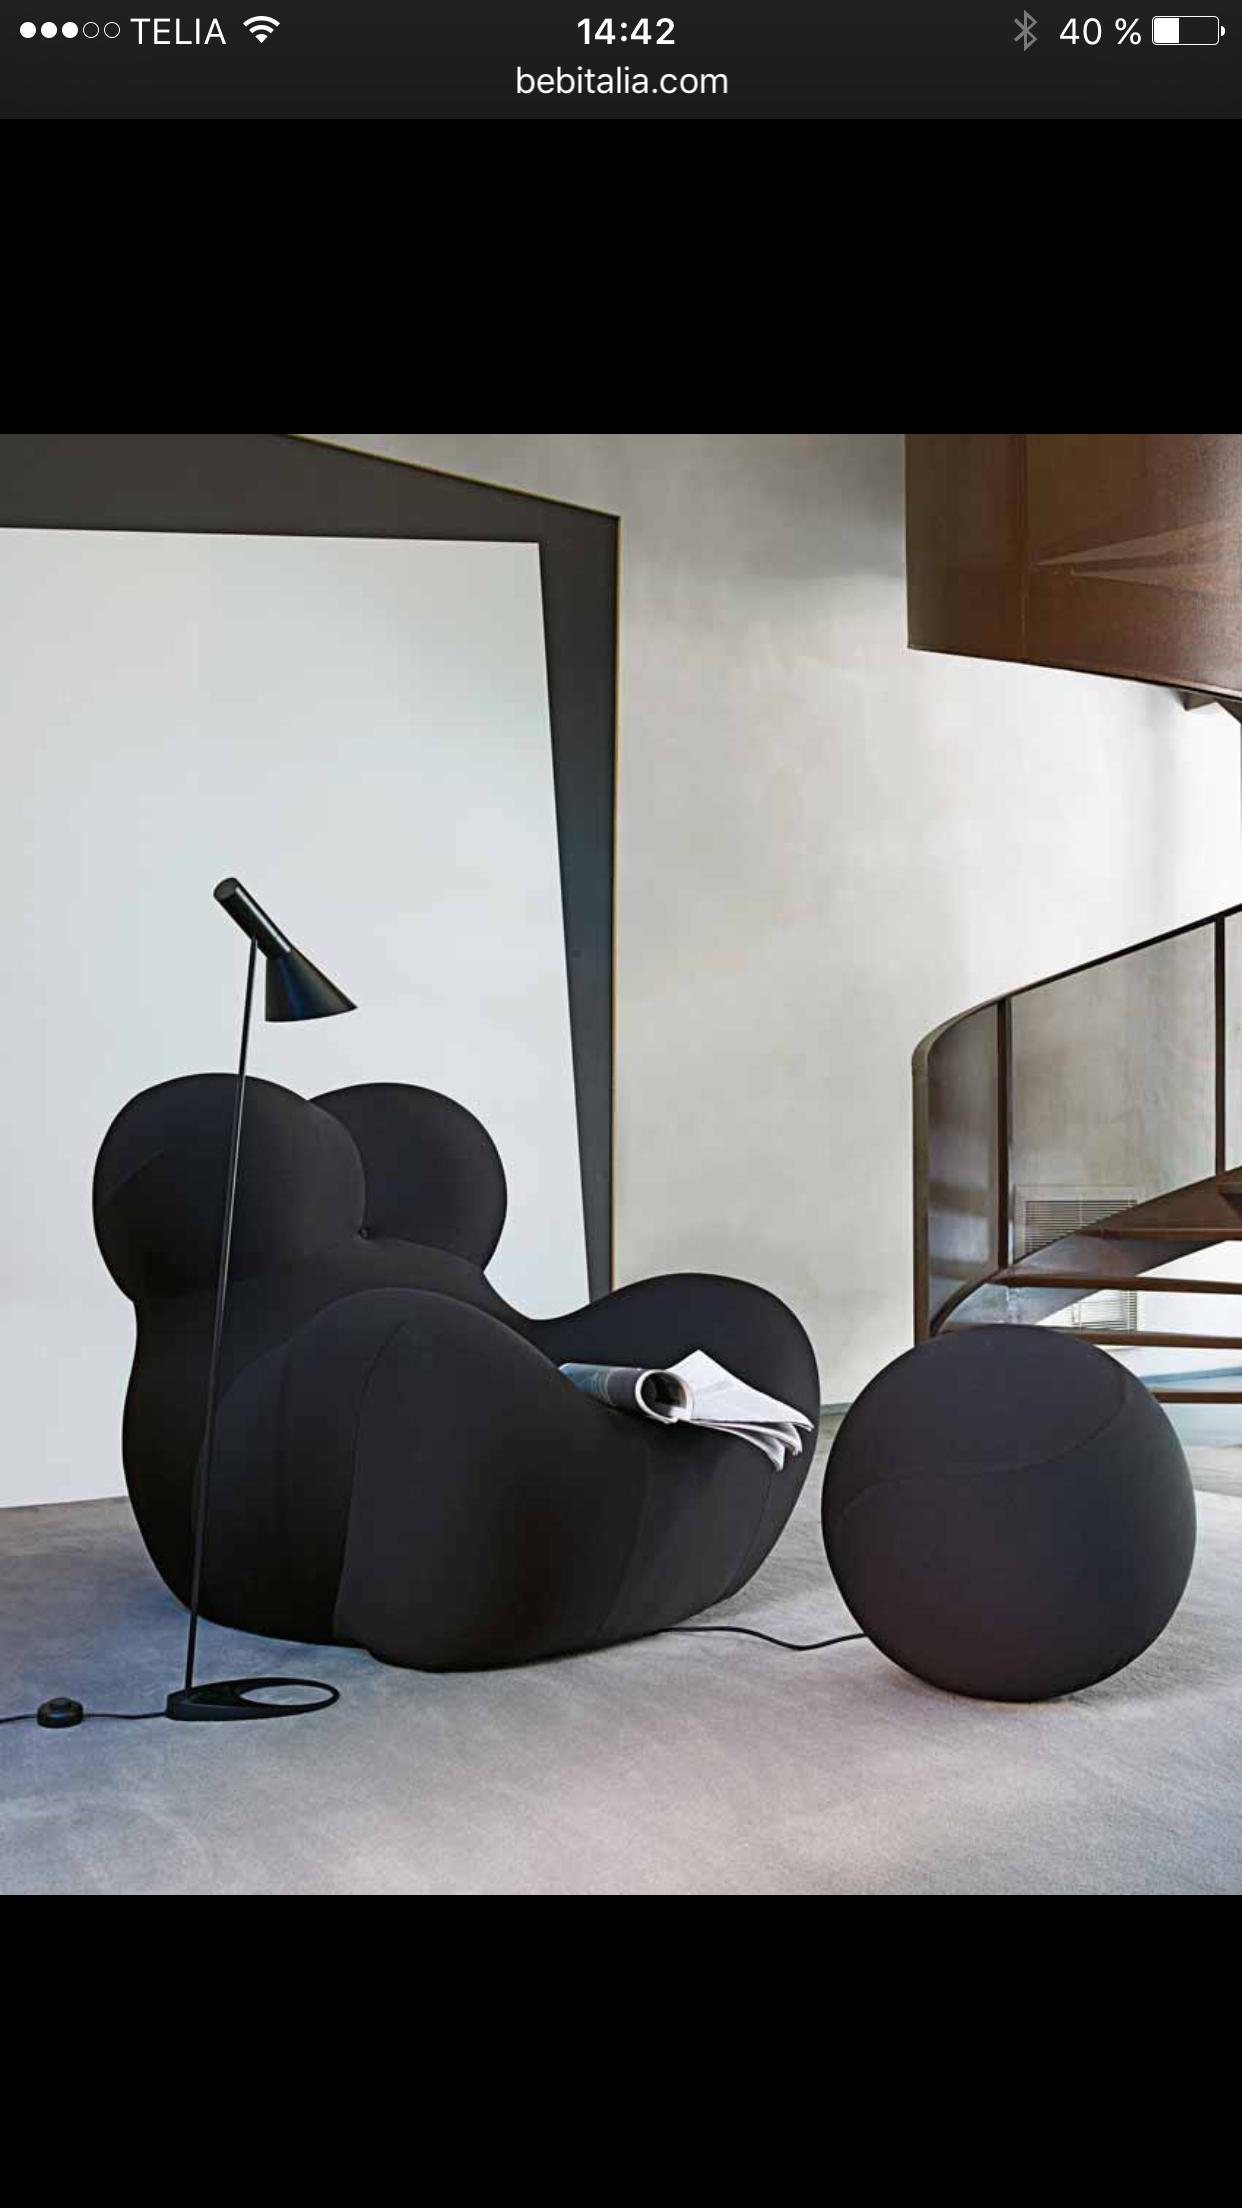 Home-entertainment-design-ideen pin by rikard svensson on möbler att sitta påi  pinterest